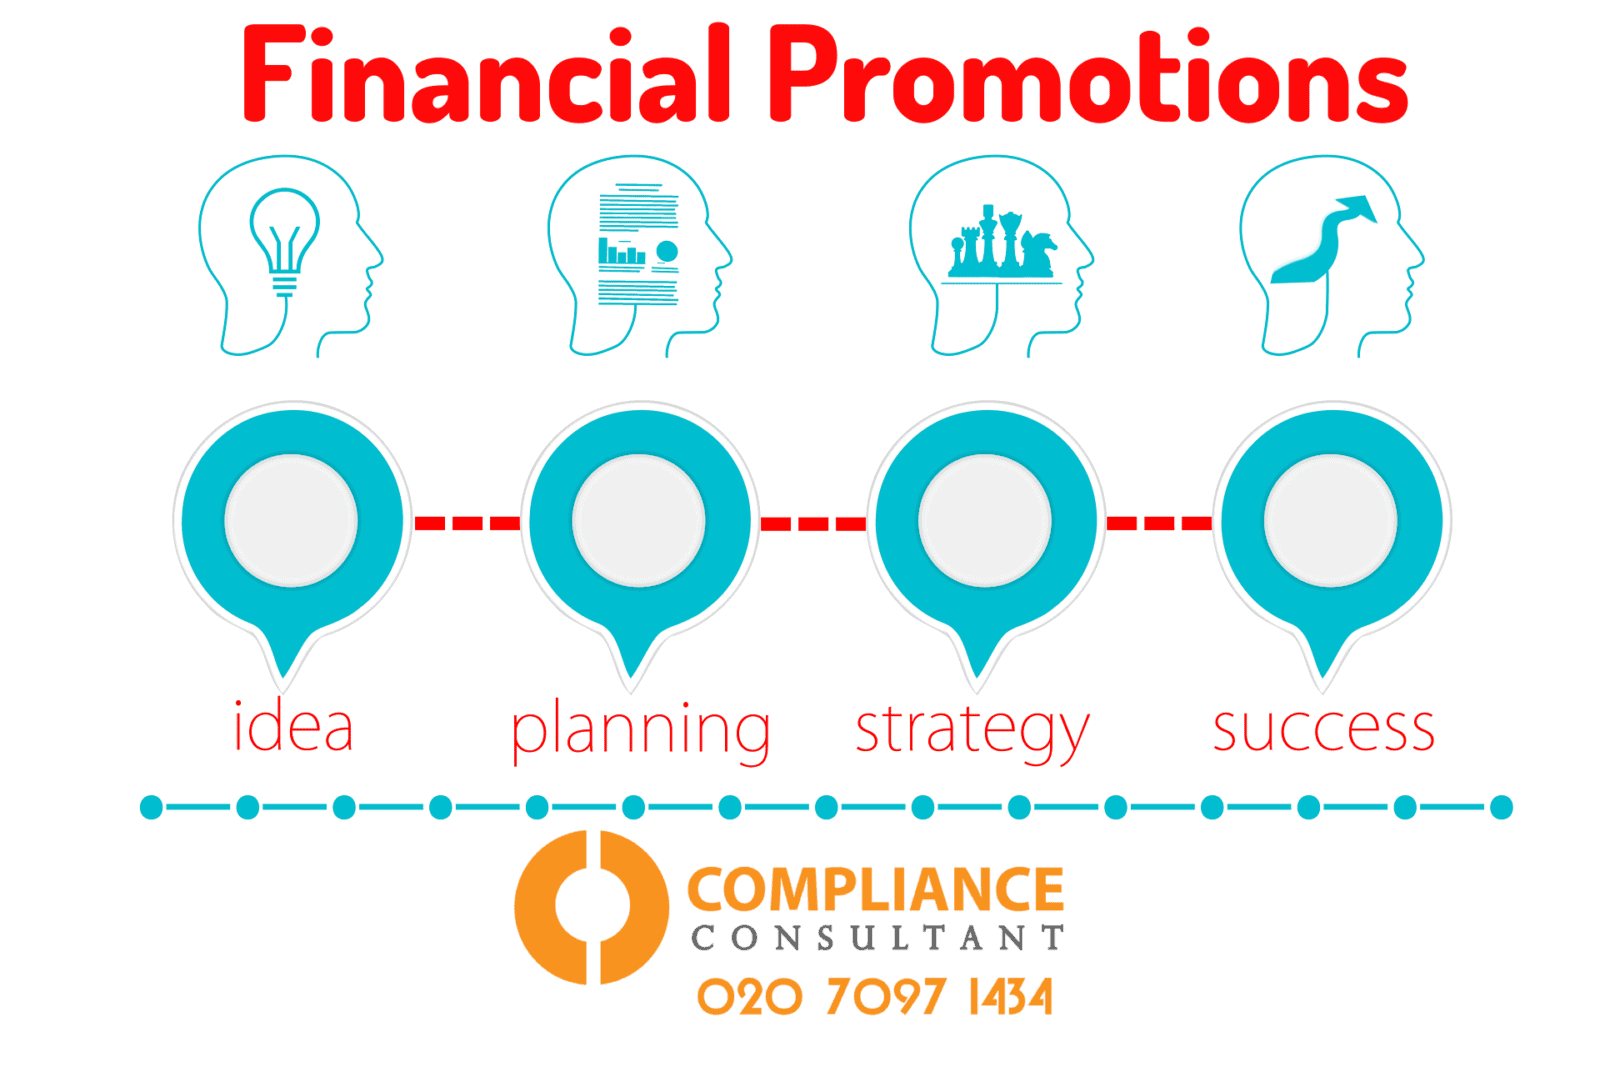 compliance consultant-compliance consultants-fca compliance consultants-financial promotions